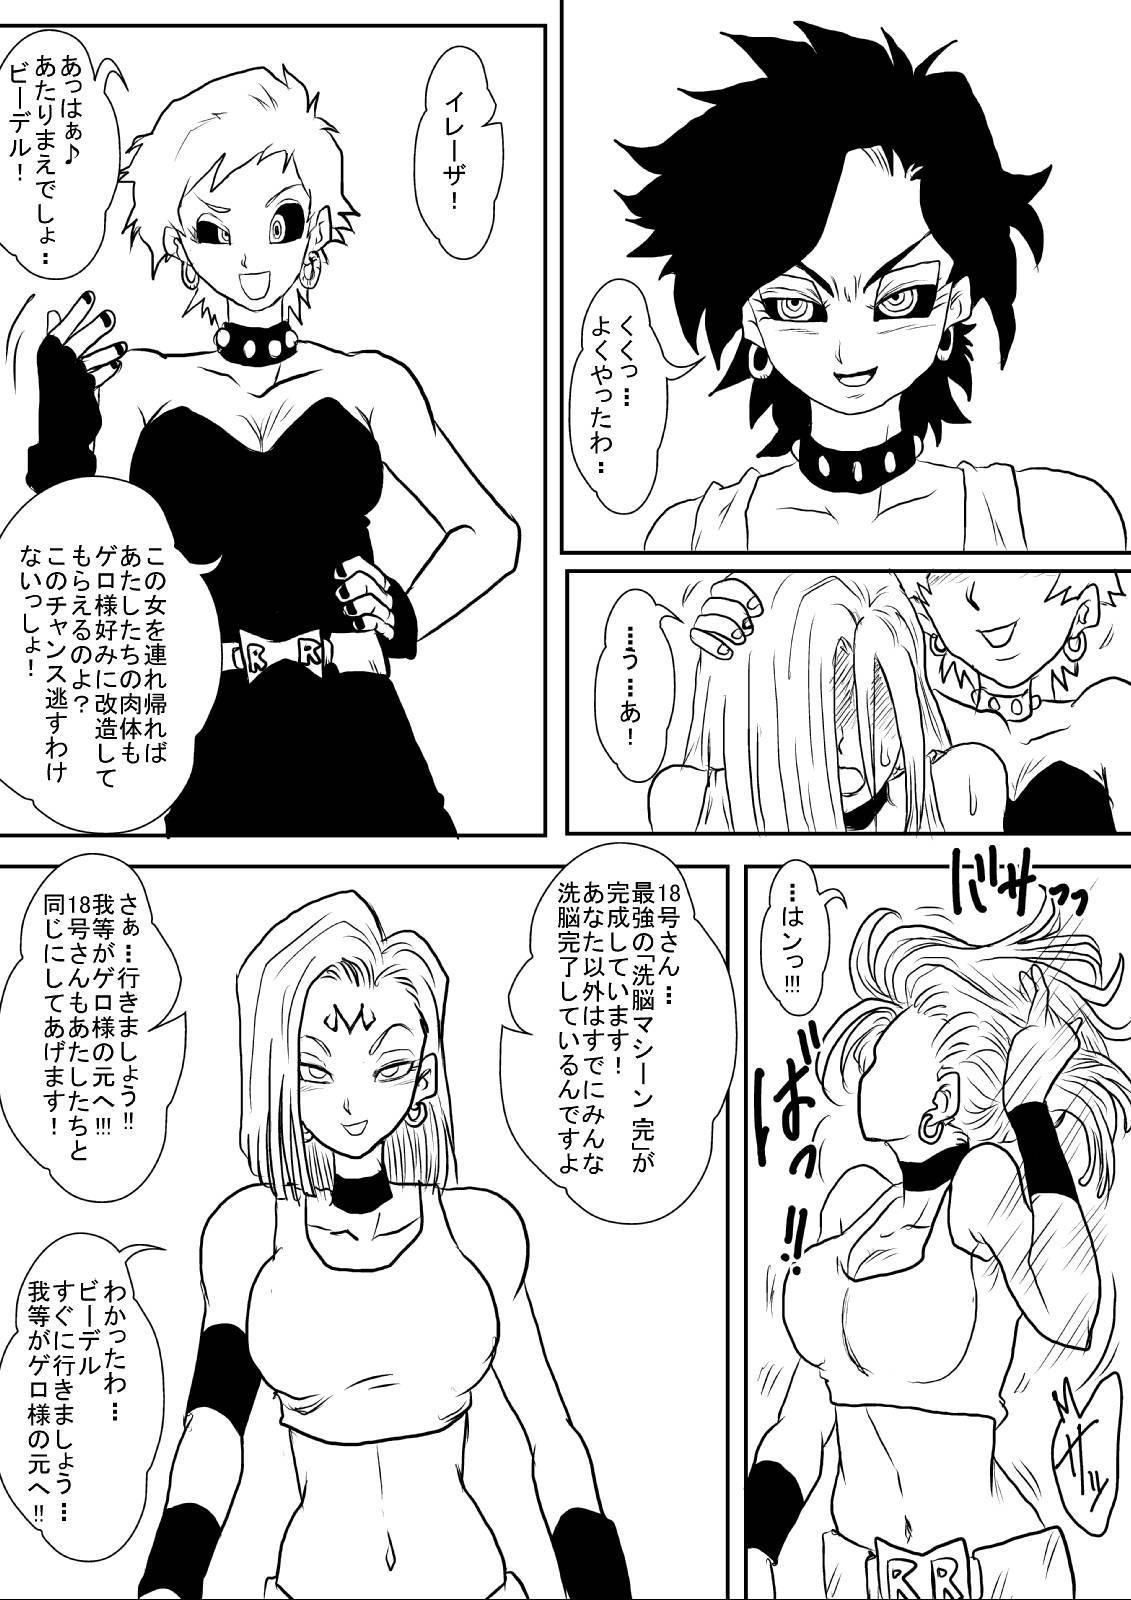 [Alice.Blood] Sennou Kyouiku-shitsu~ Jinzou ☆-kan 18-gou-hen (Dragon Ball Z) 25